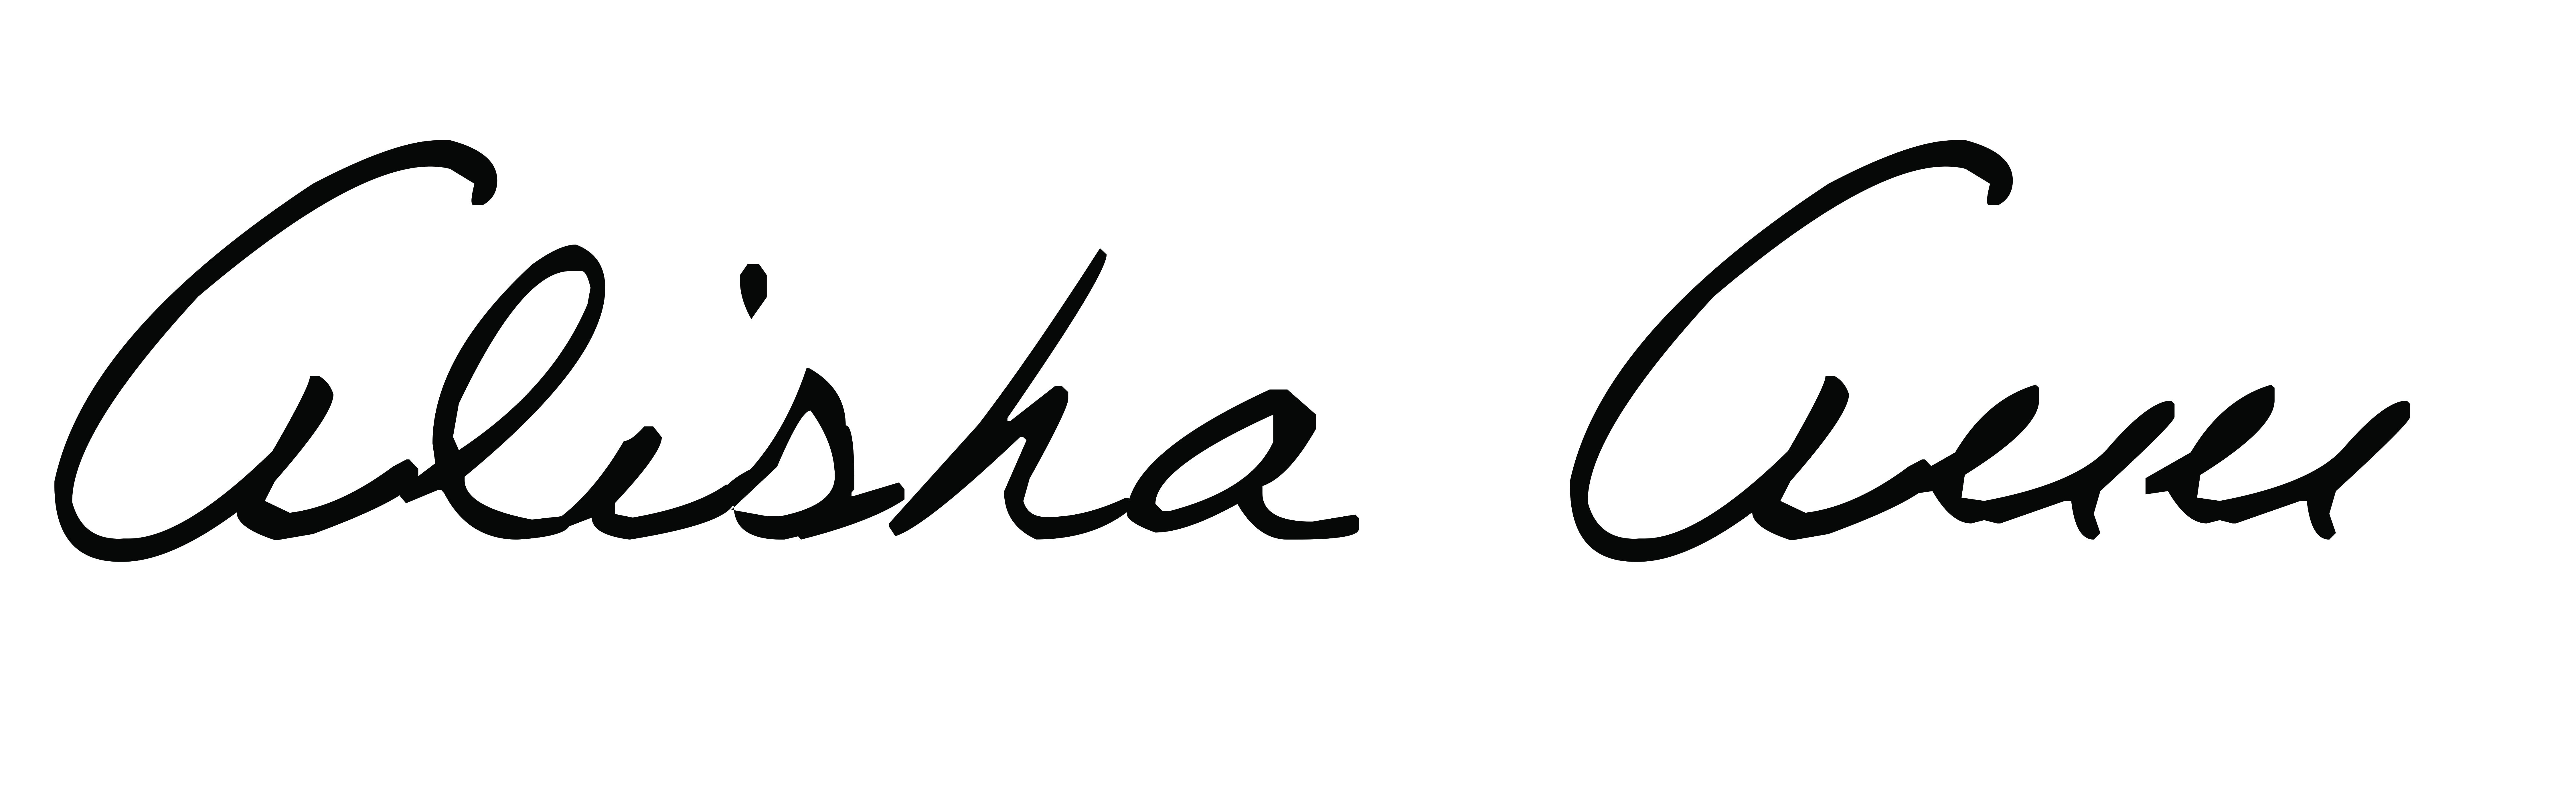 Alisha Boguslowski Signature